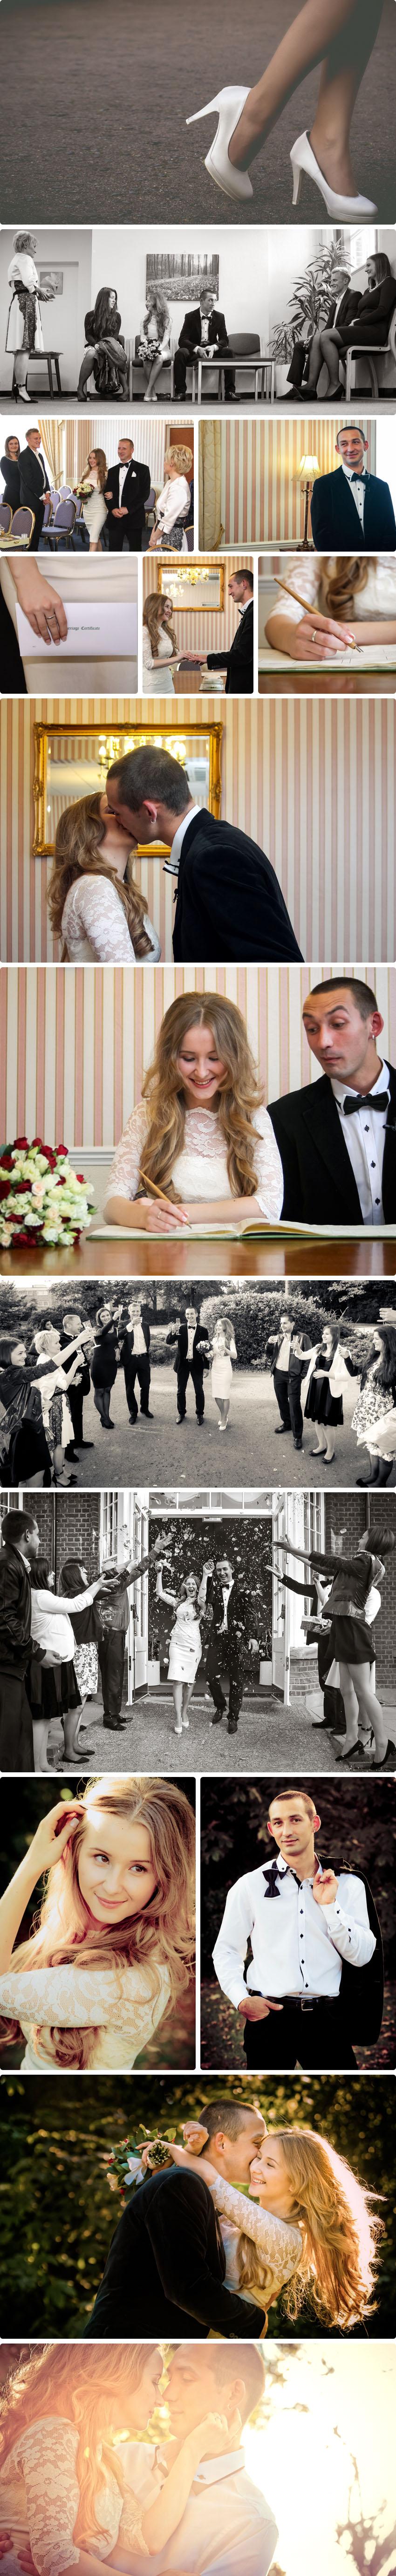 Intro images of the Ukrainian wedding